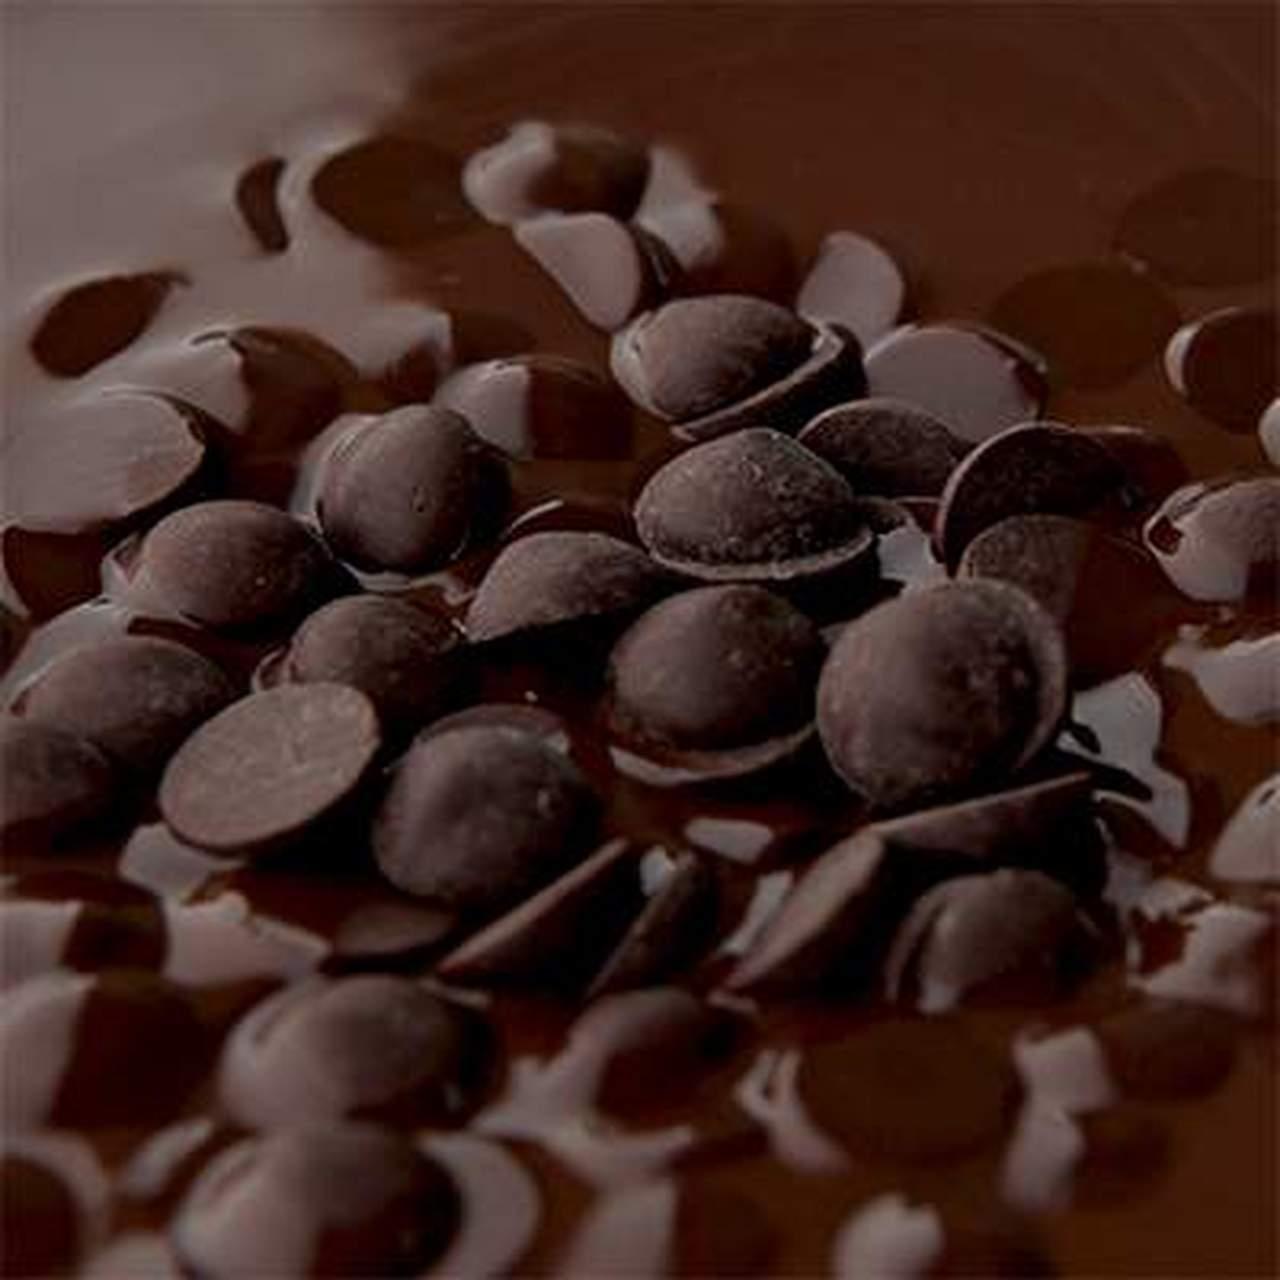 Cacao_Chocolate_Chocolate_Liquor__1551729718_104.172.159.225__96045.1551729753.jpg